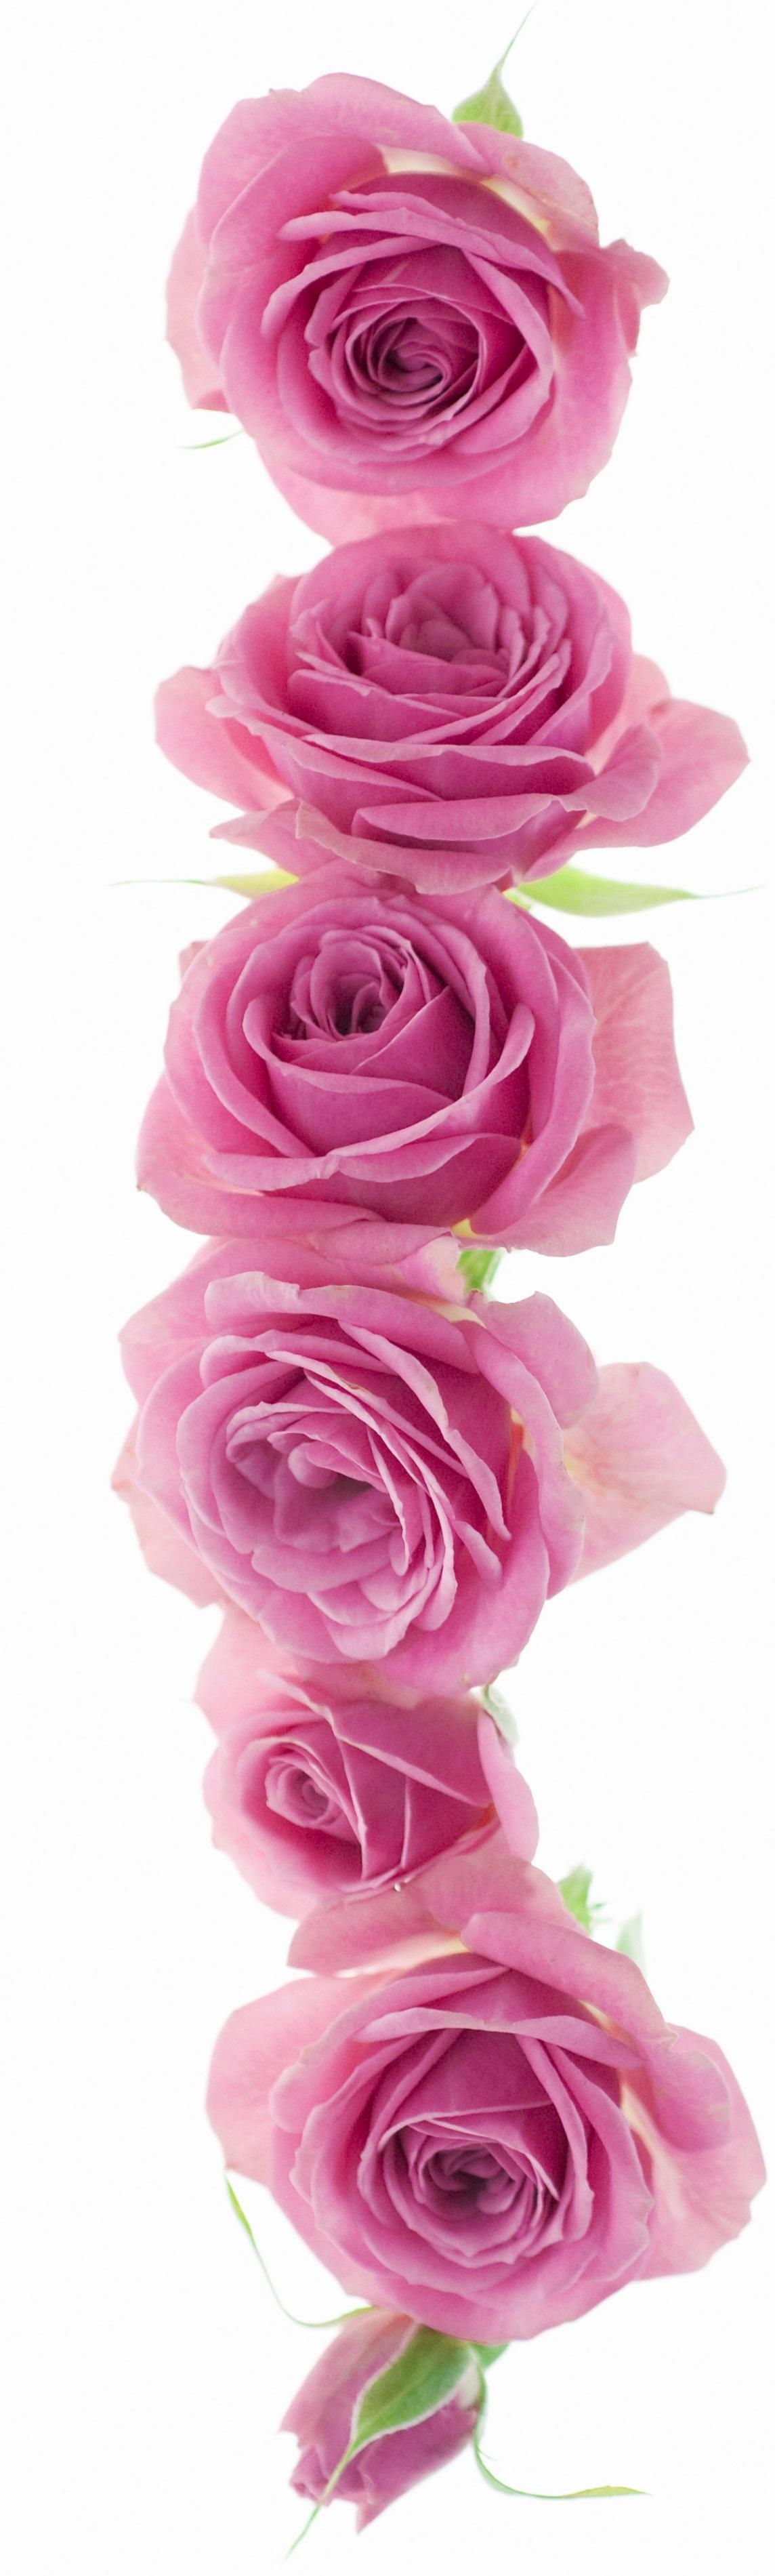 Rose vine